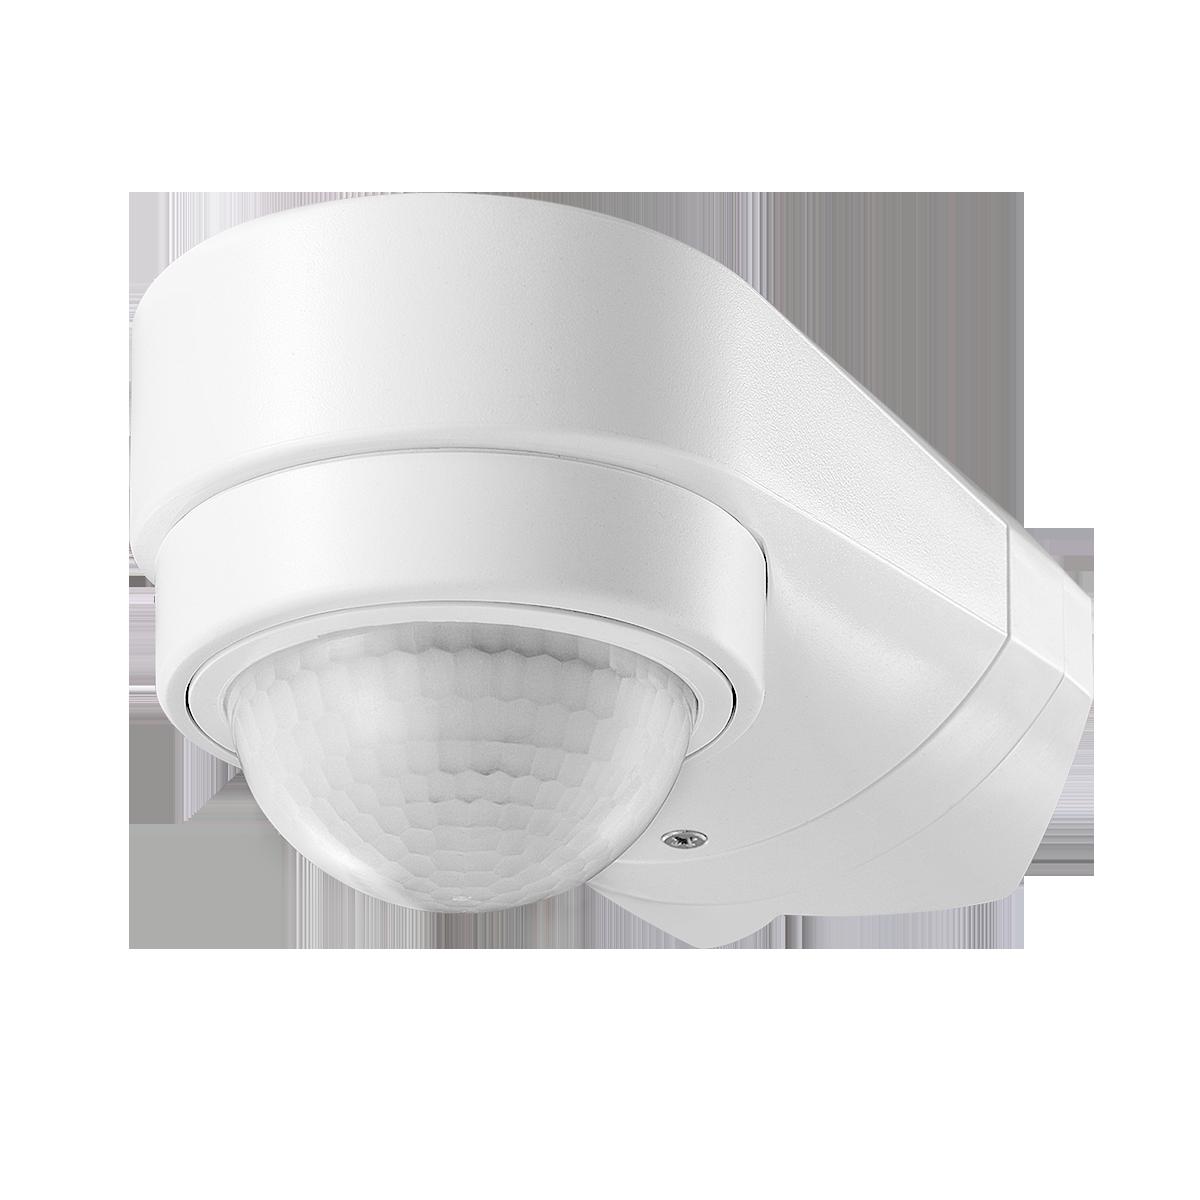 Motion sensor 240°, IP65, 2 sensors